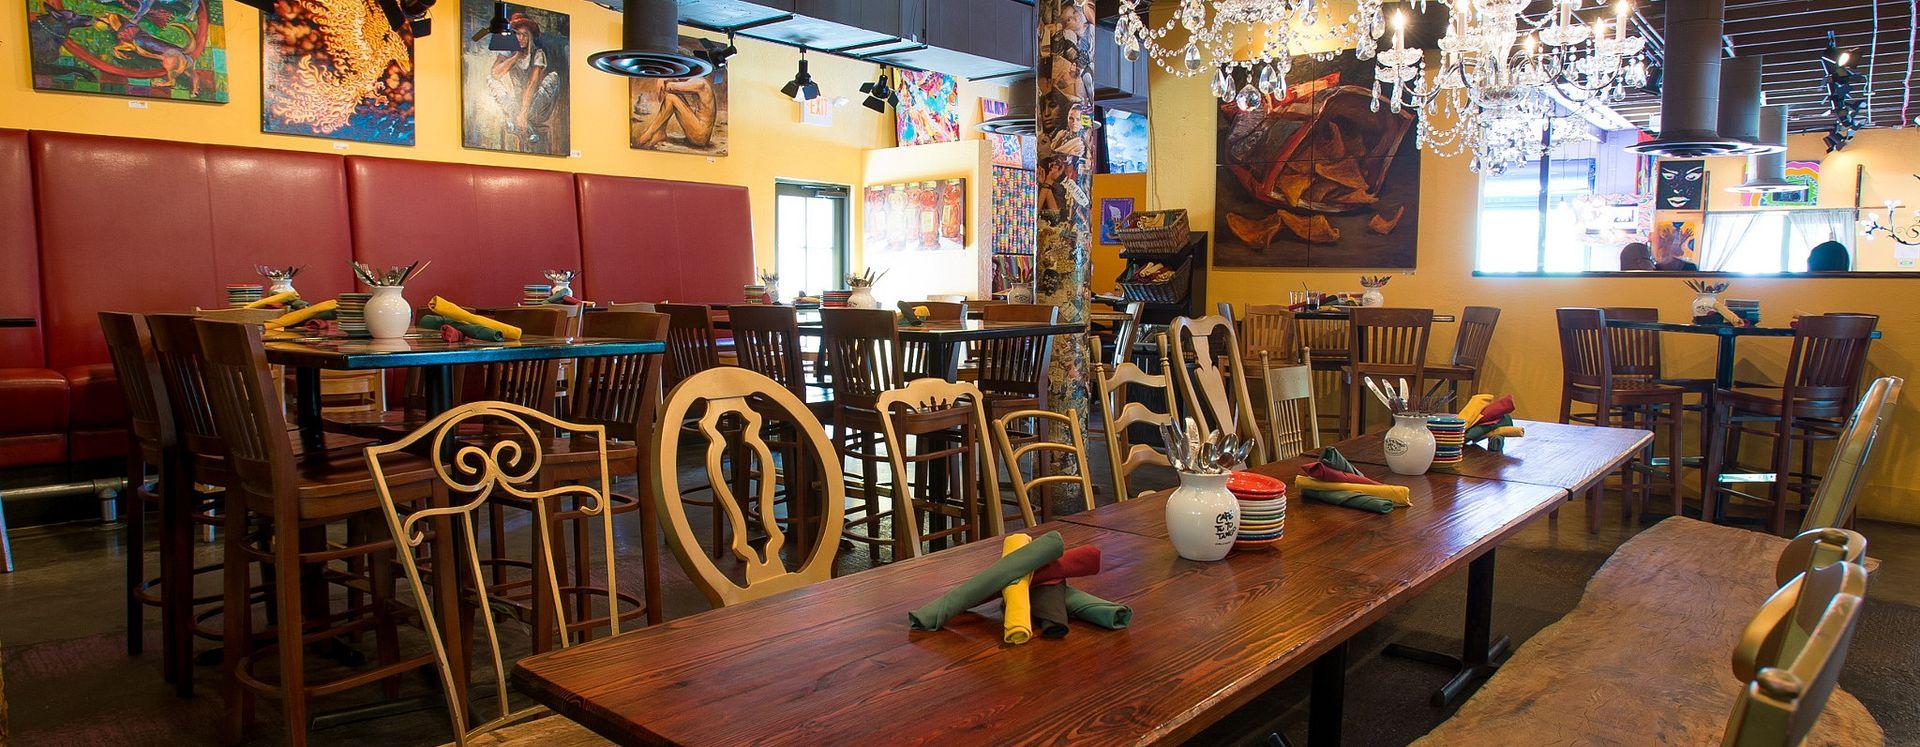 Interior seating area of Cafe Tu Tu Tango